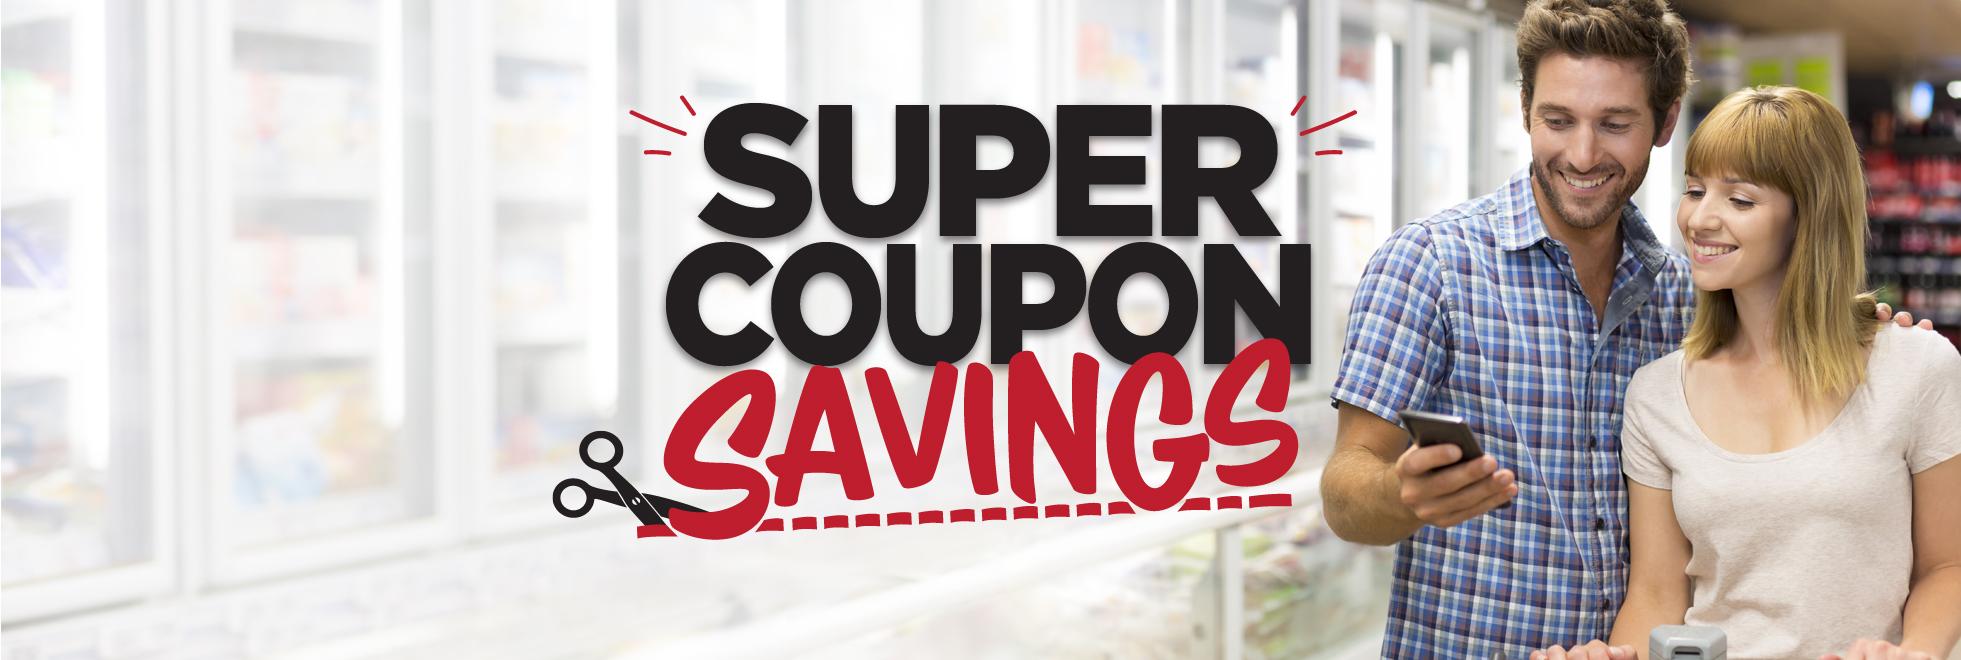 Super Coupon Savings